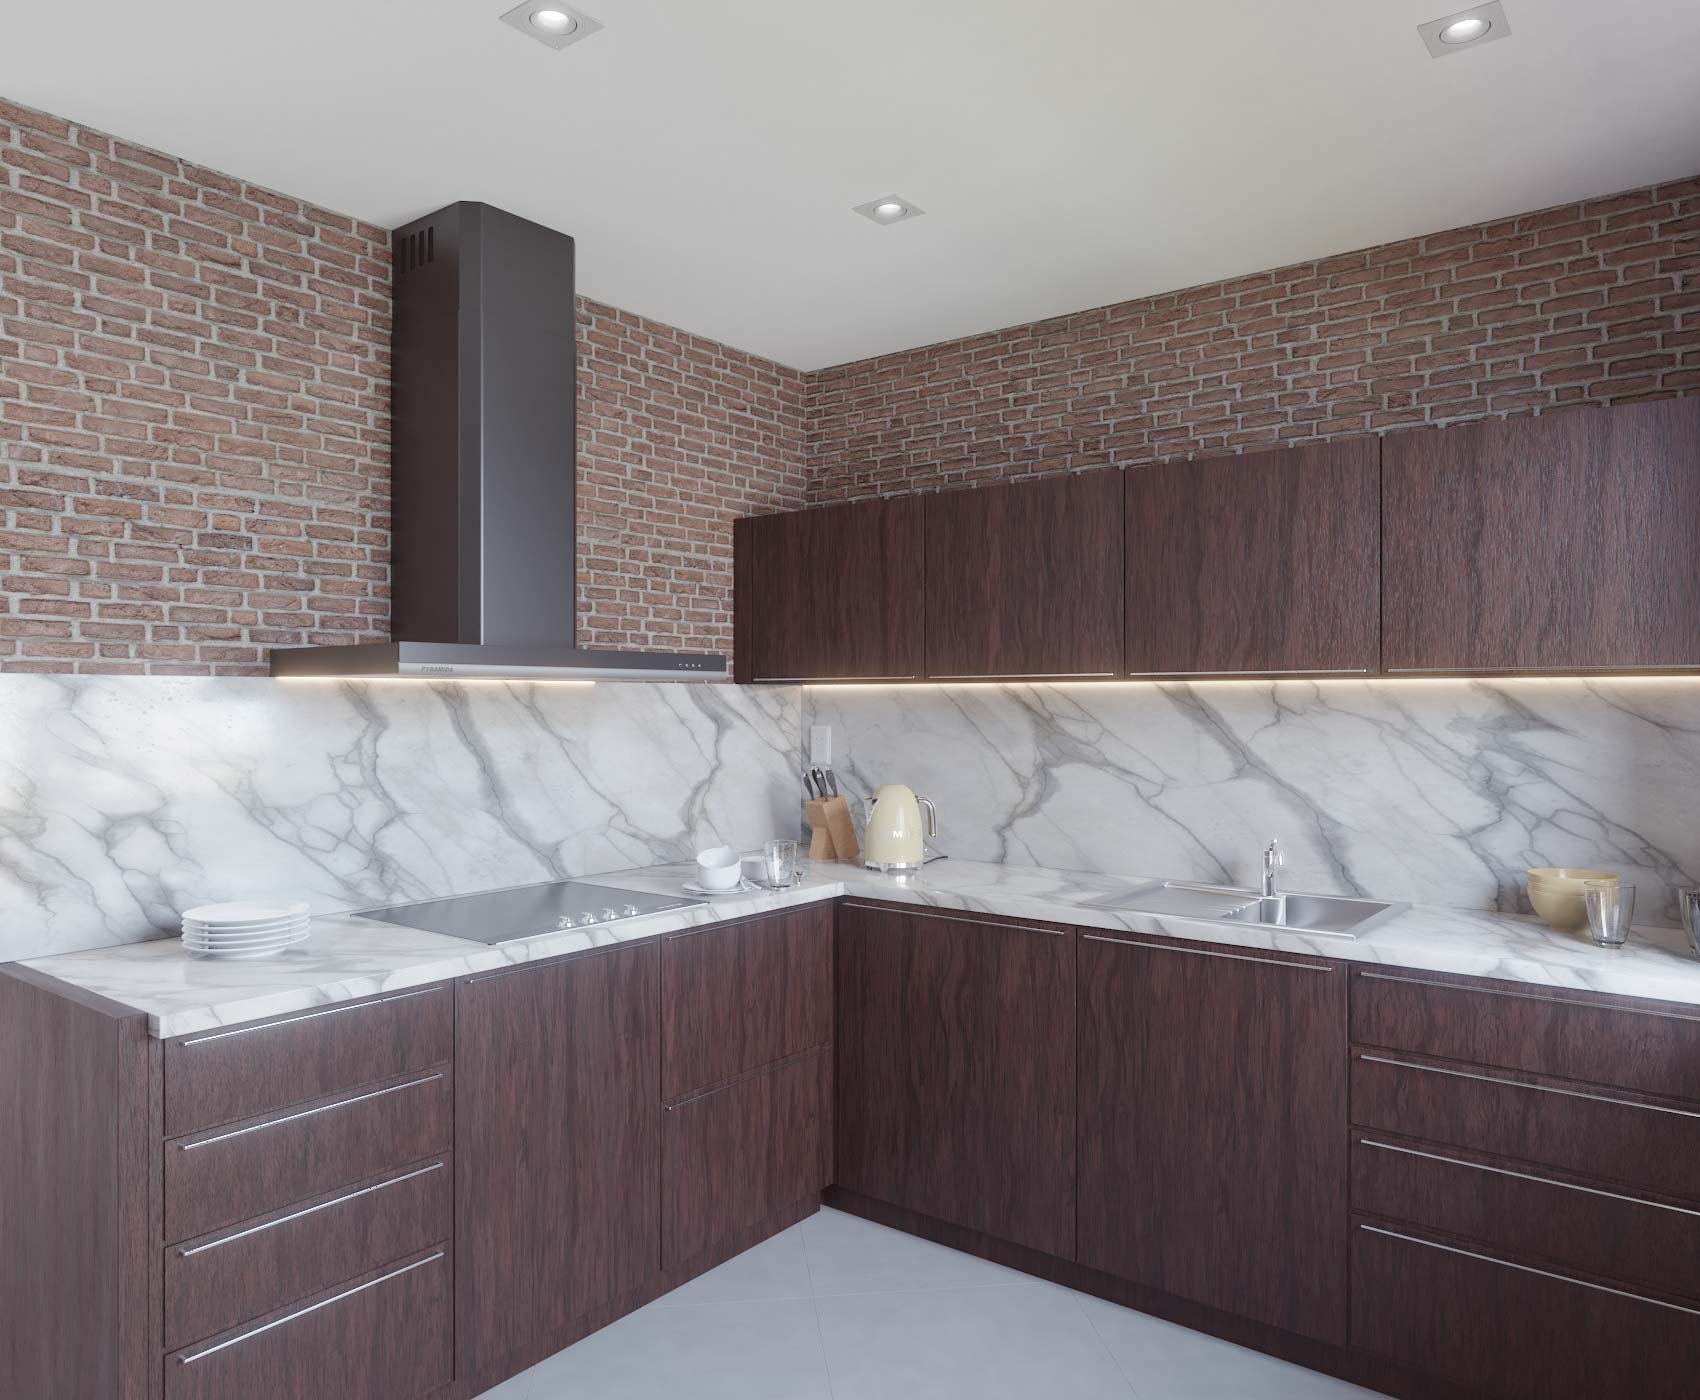 idea3d - vizualizácia kuchyňa 2